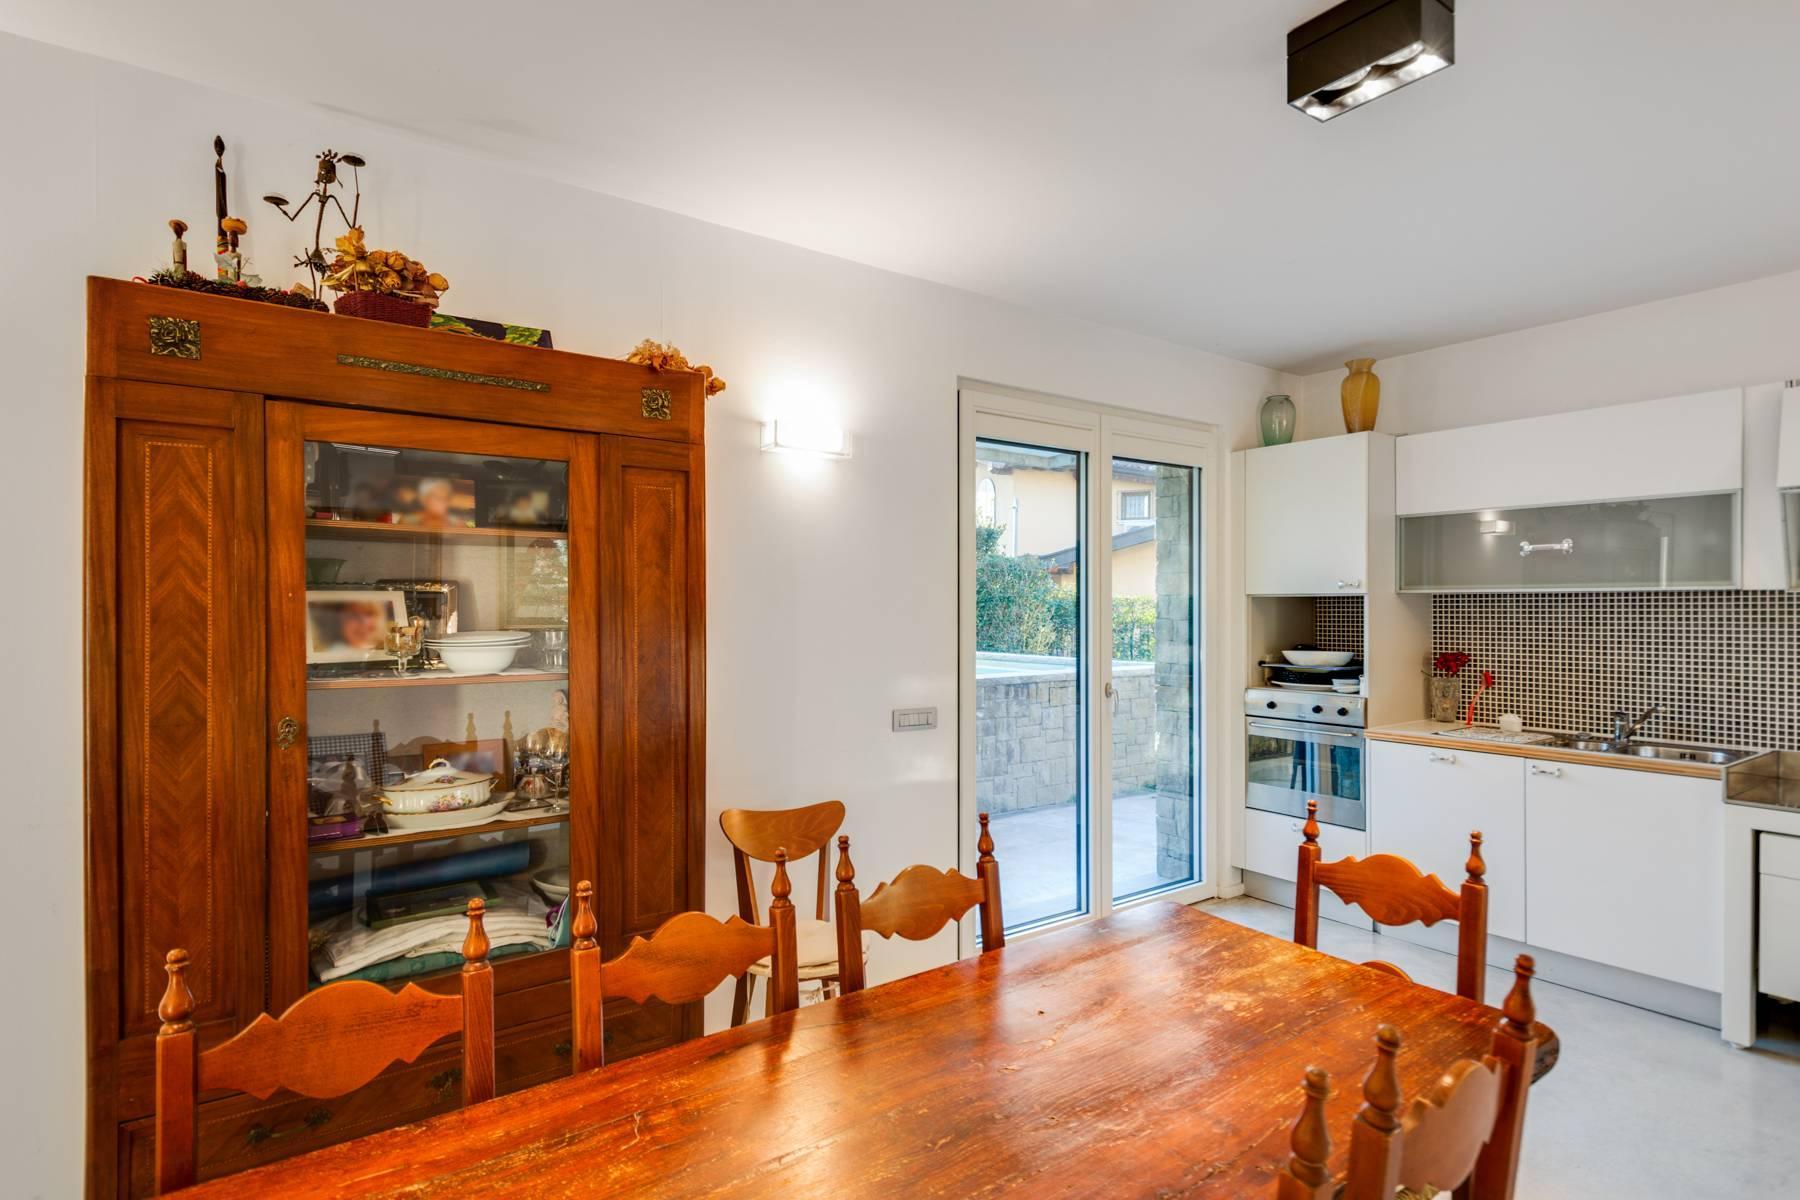 International Style villa in the heart of Franciacorta - 21